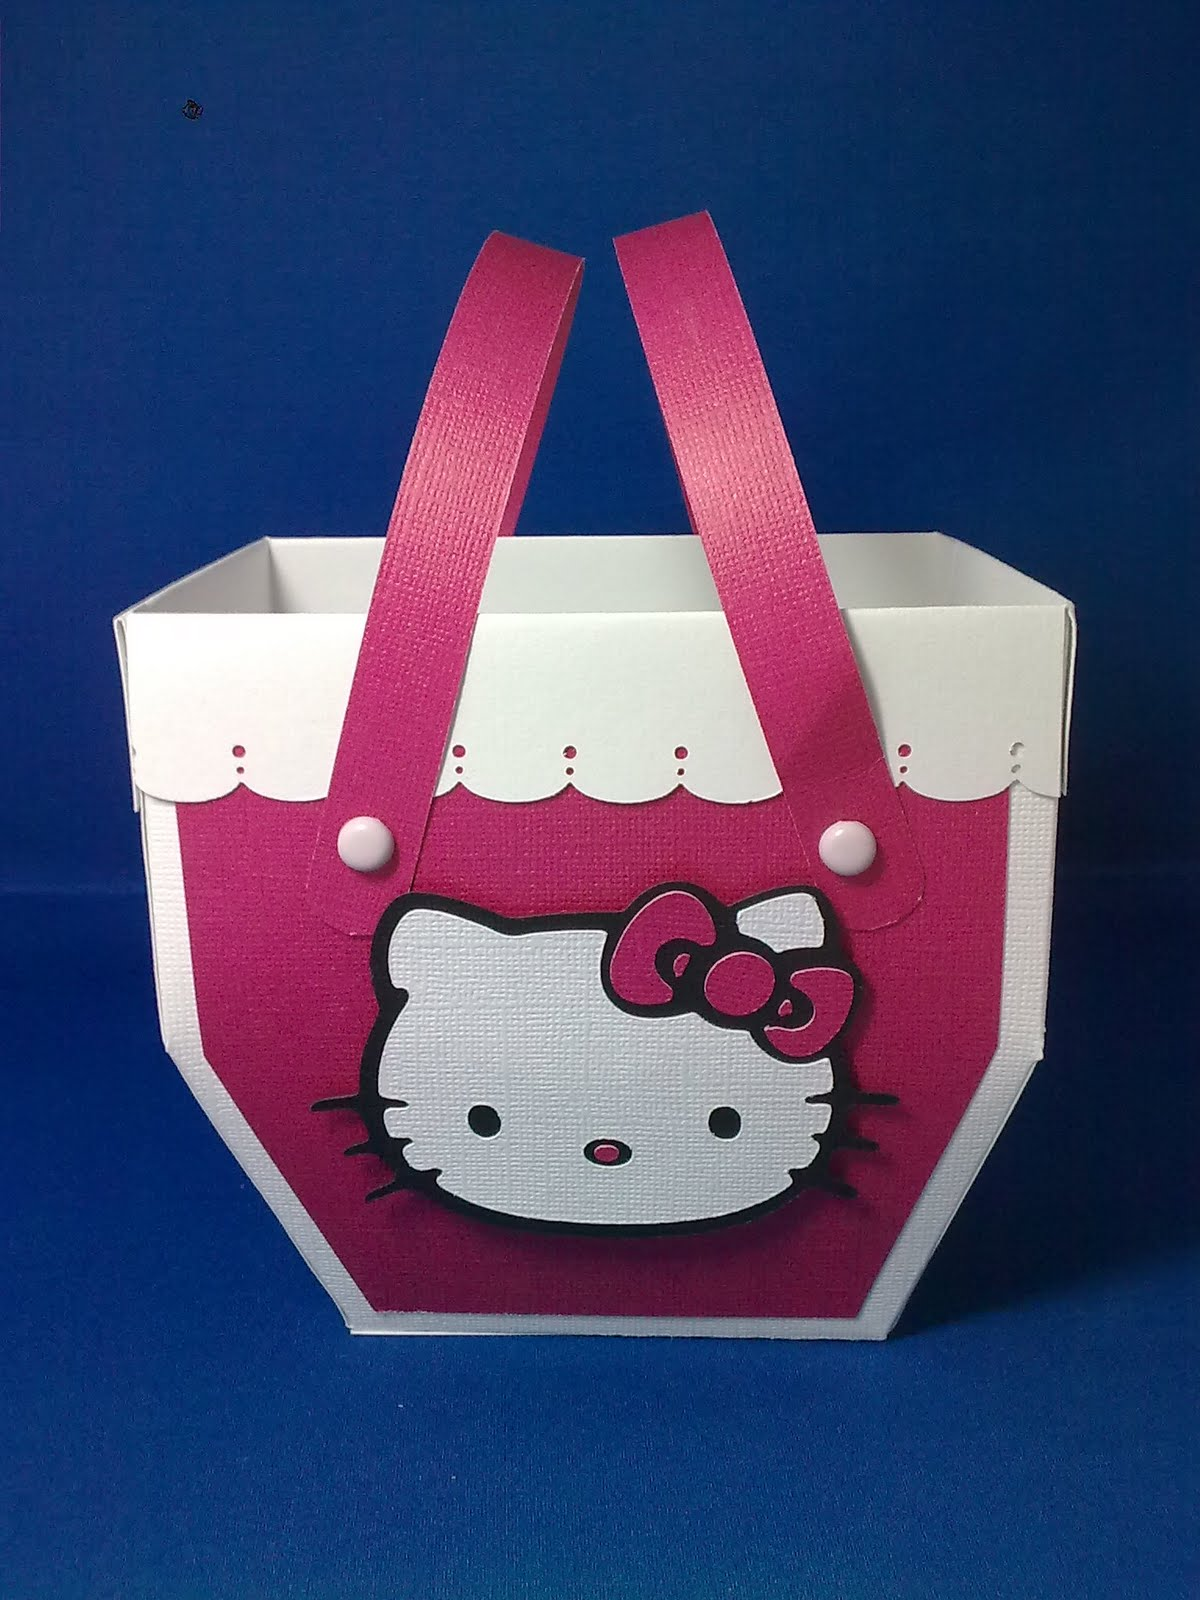 hello kitty cut out template - enchanting magick hello kitty picnic box